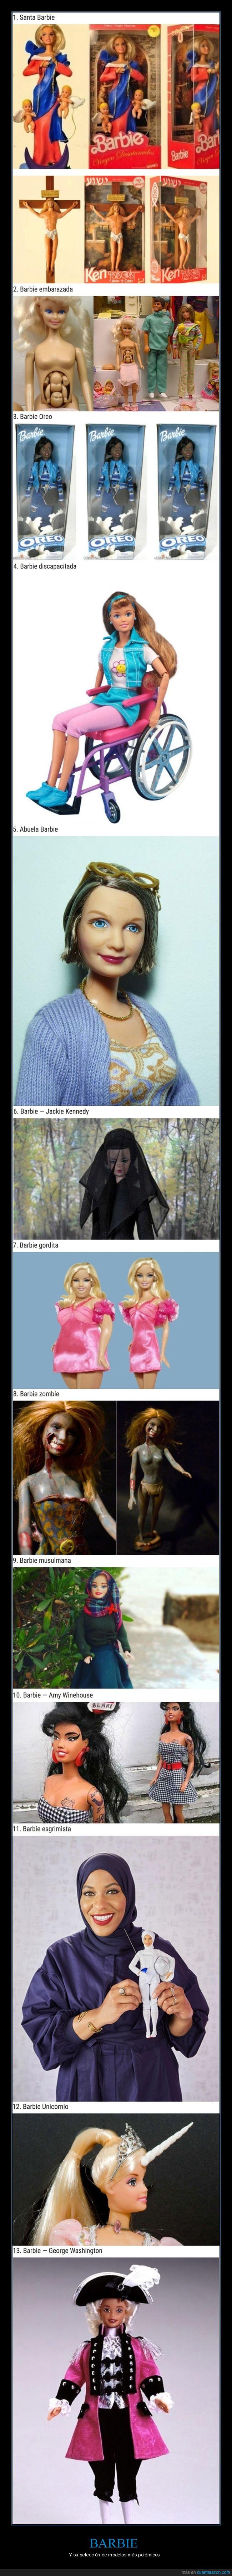 barbie,juguetes,muñecas